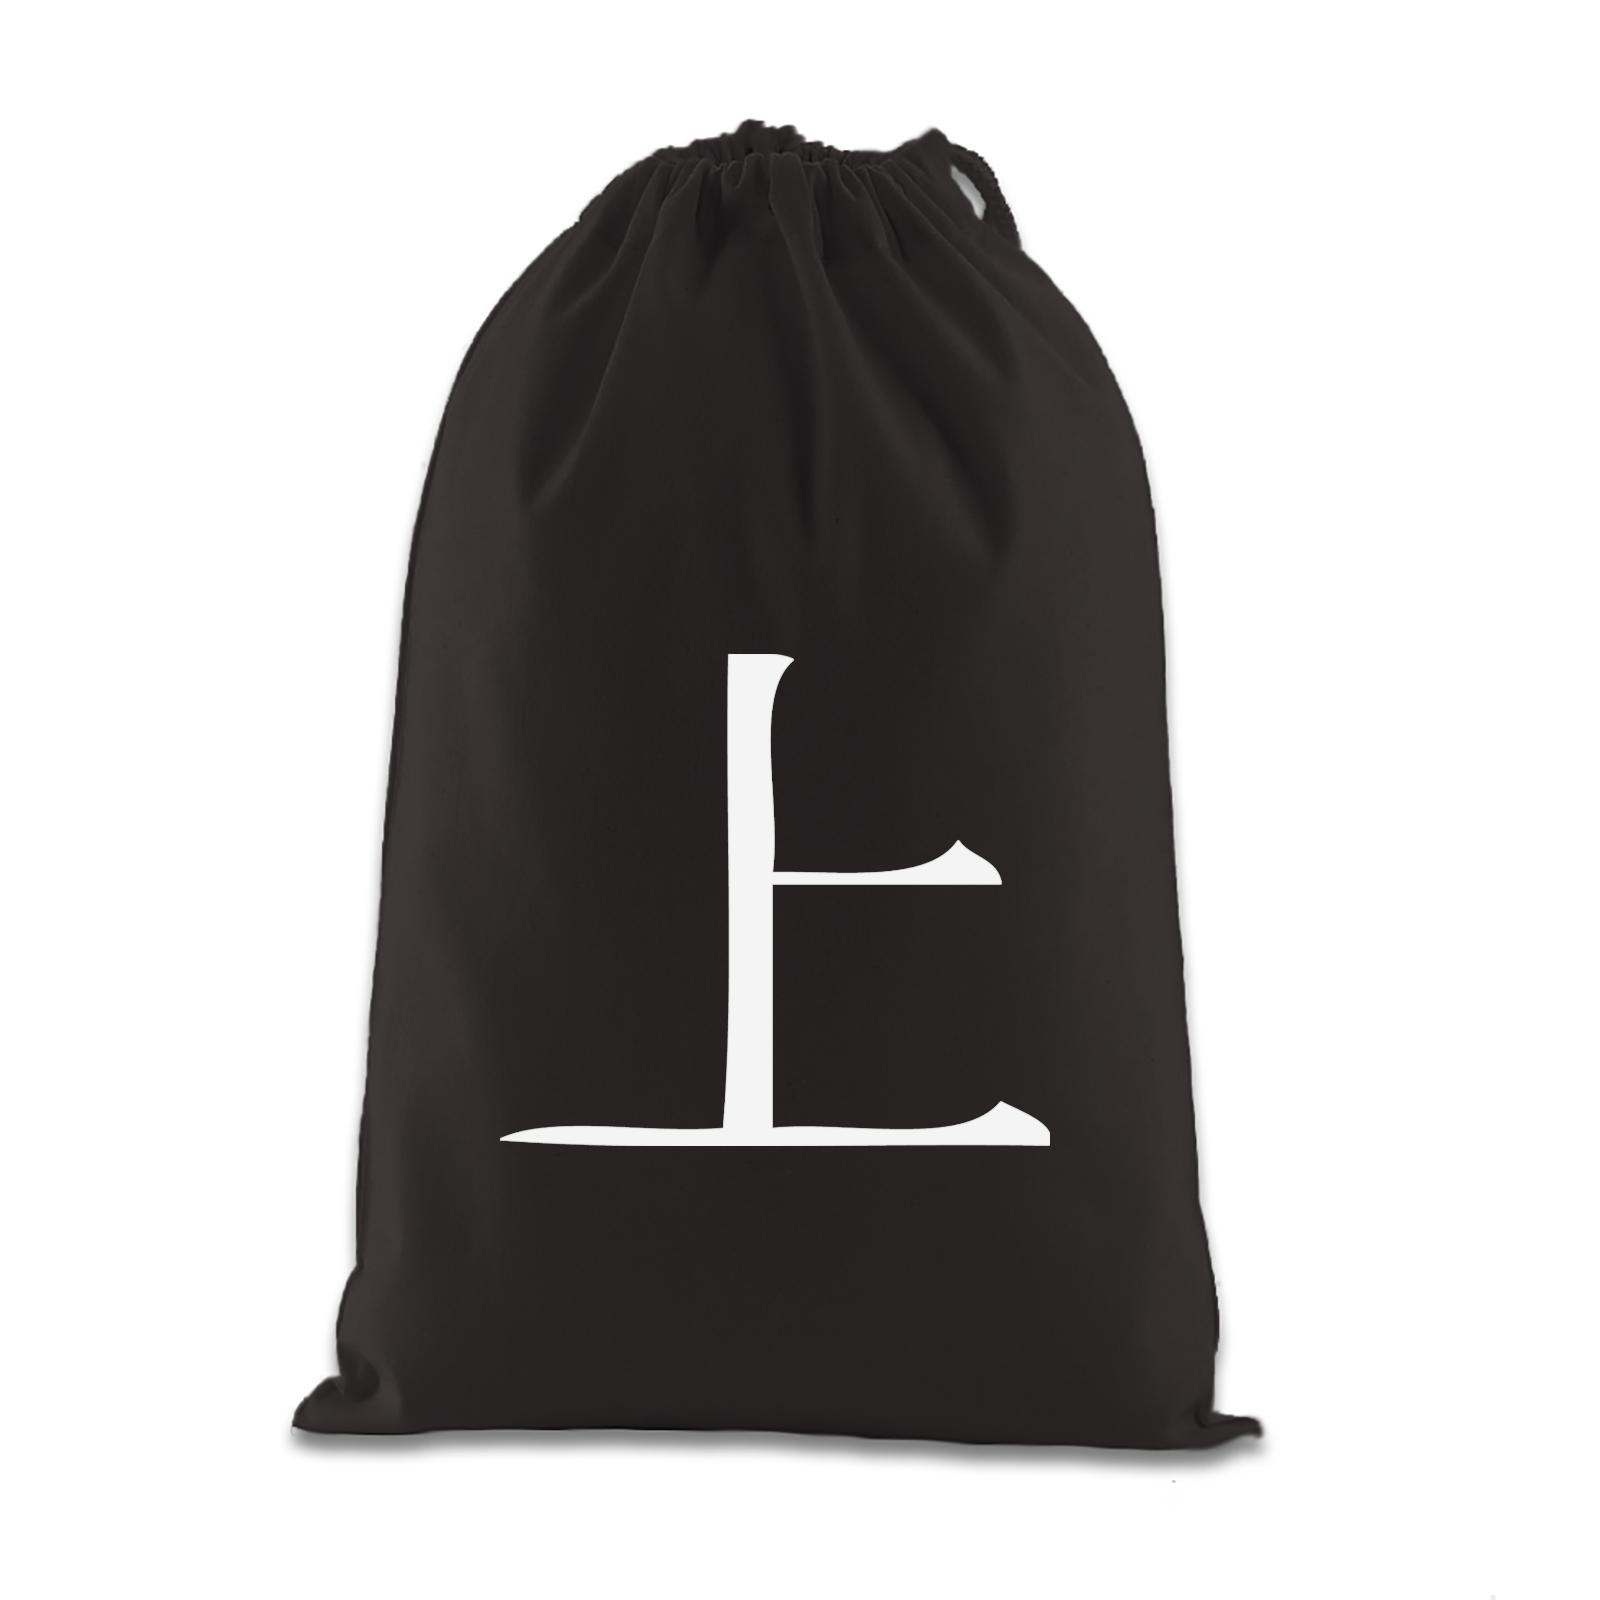 Picture of Above Kanji Logo Anime Manga Gift Bag